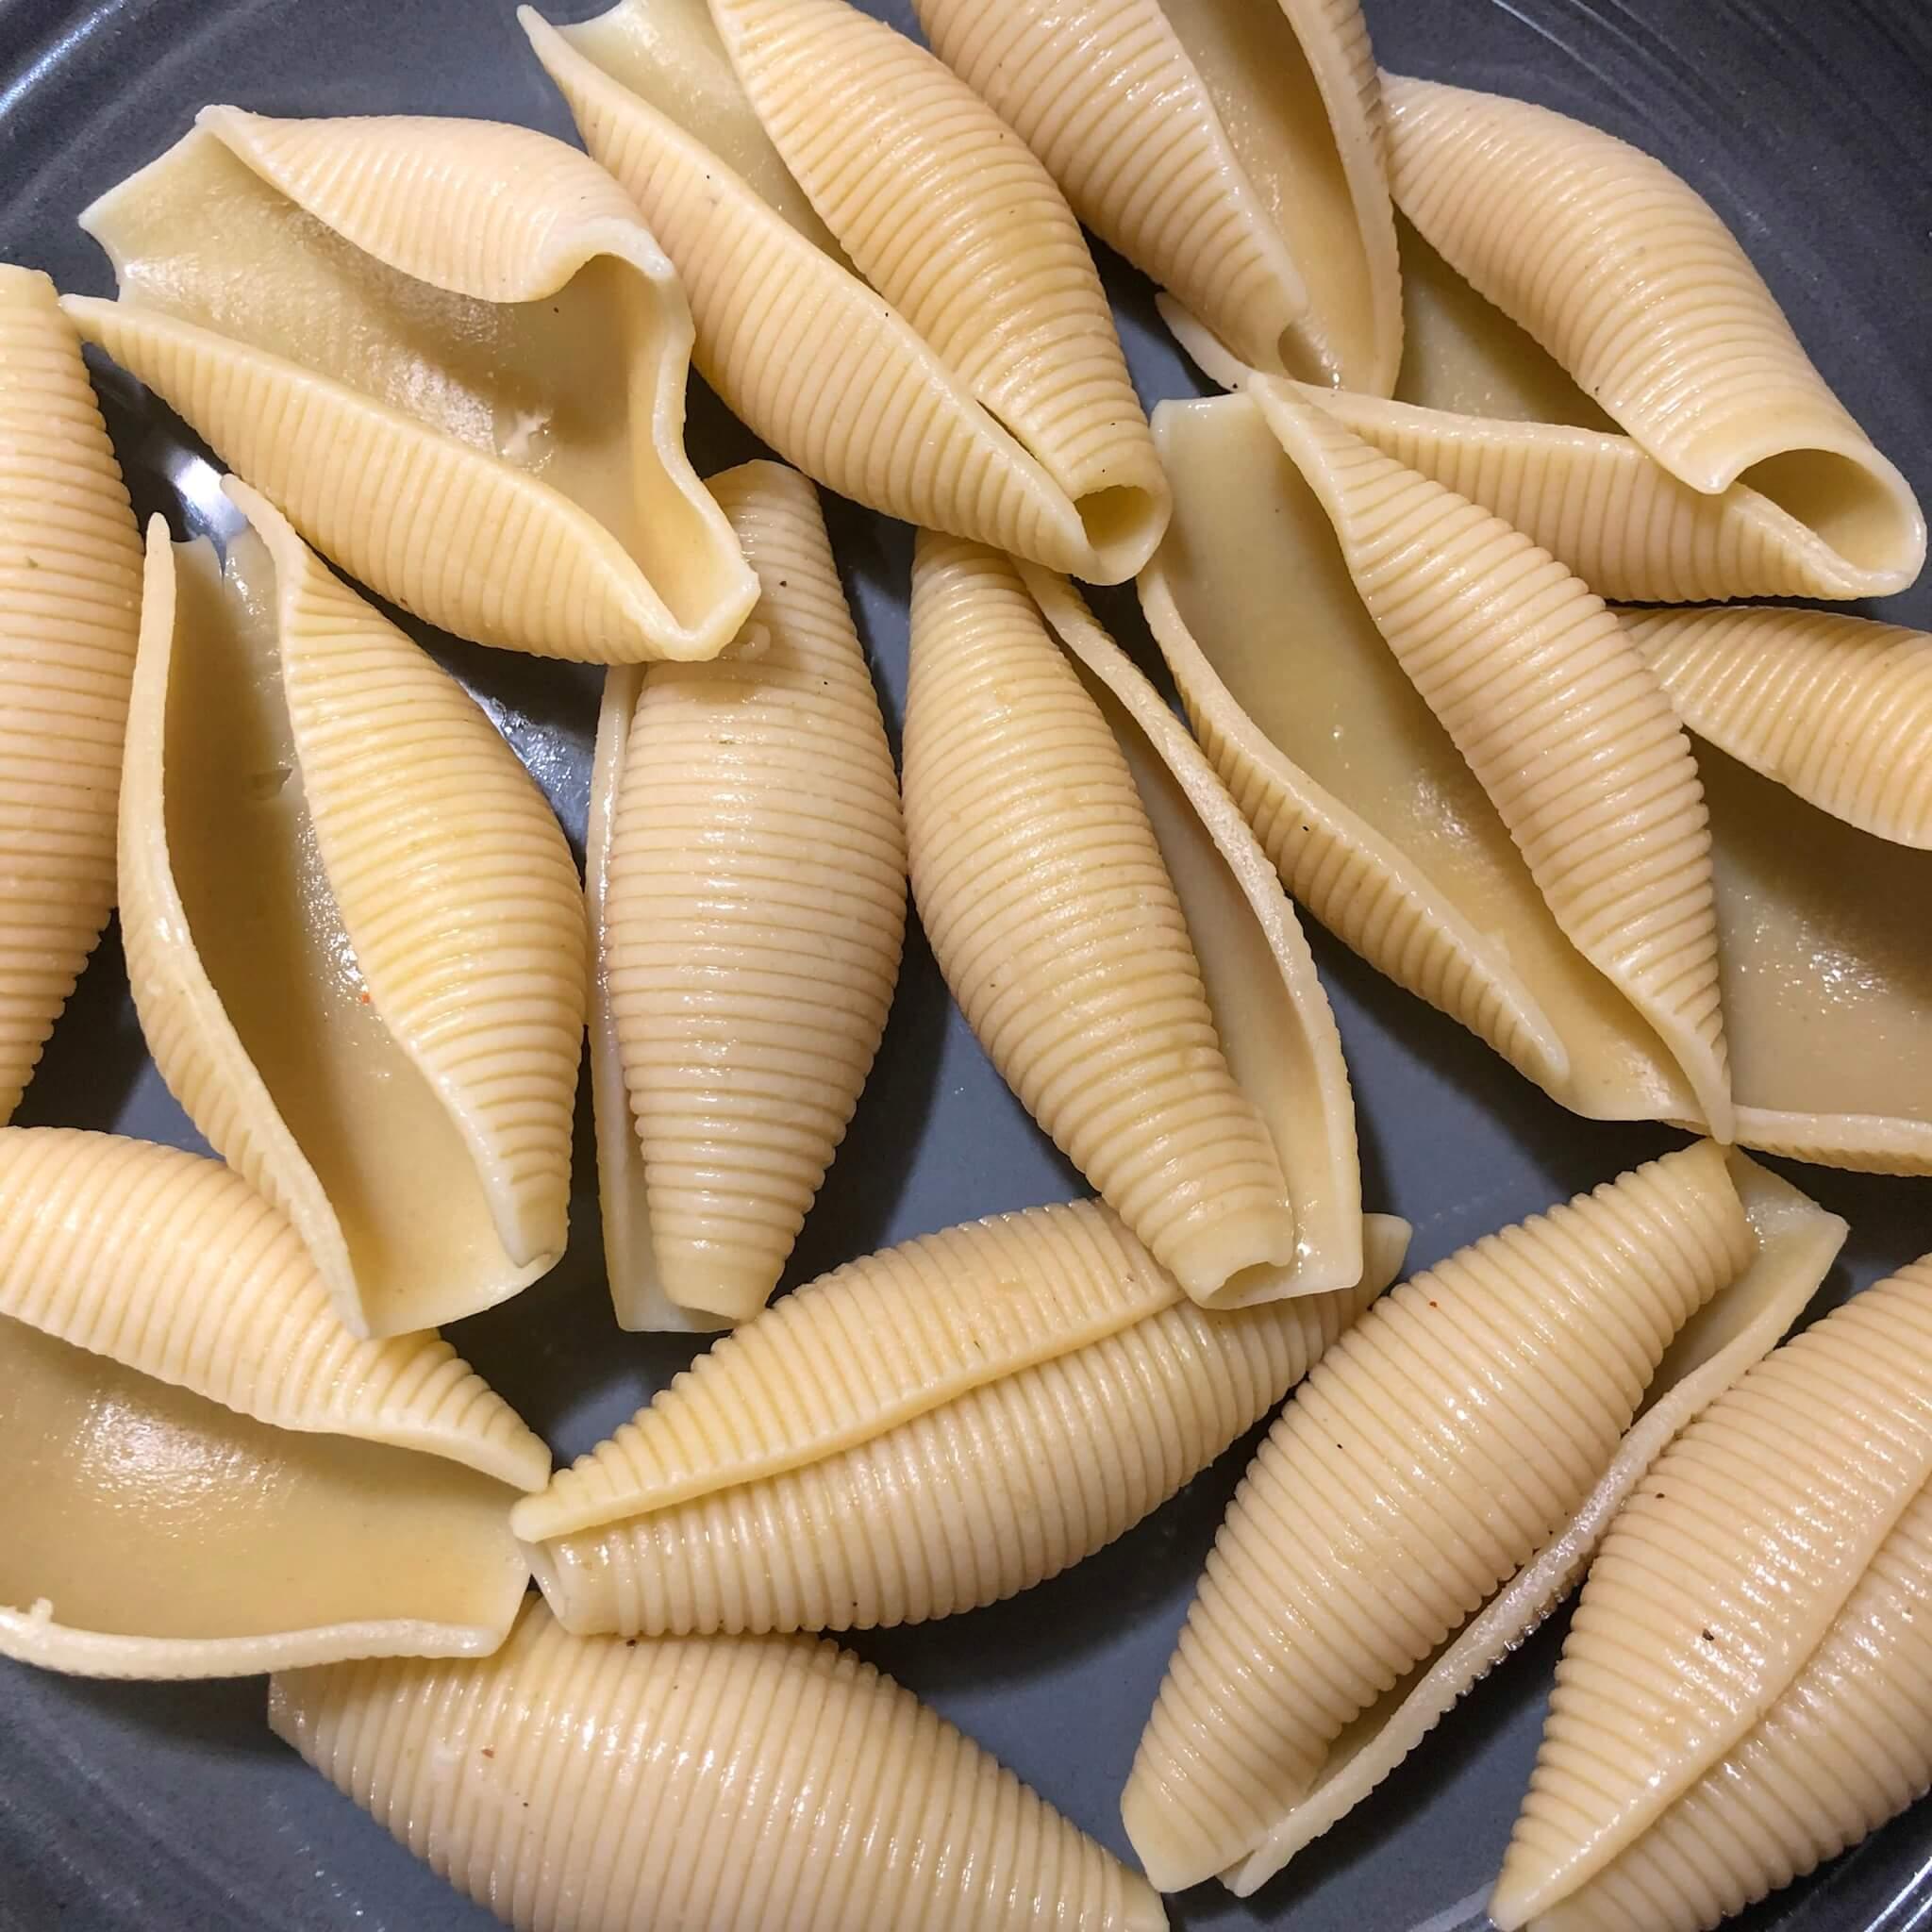 stuffed shells without the ricotta cheese